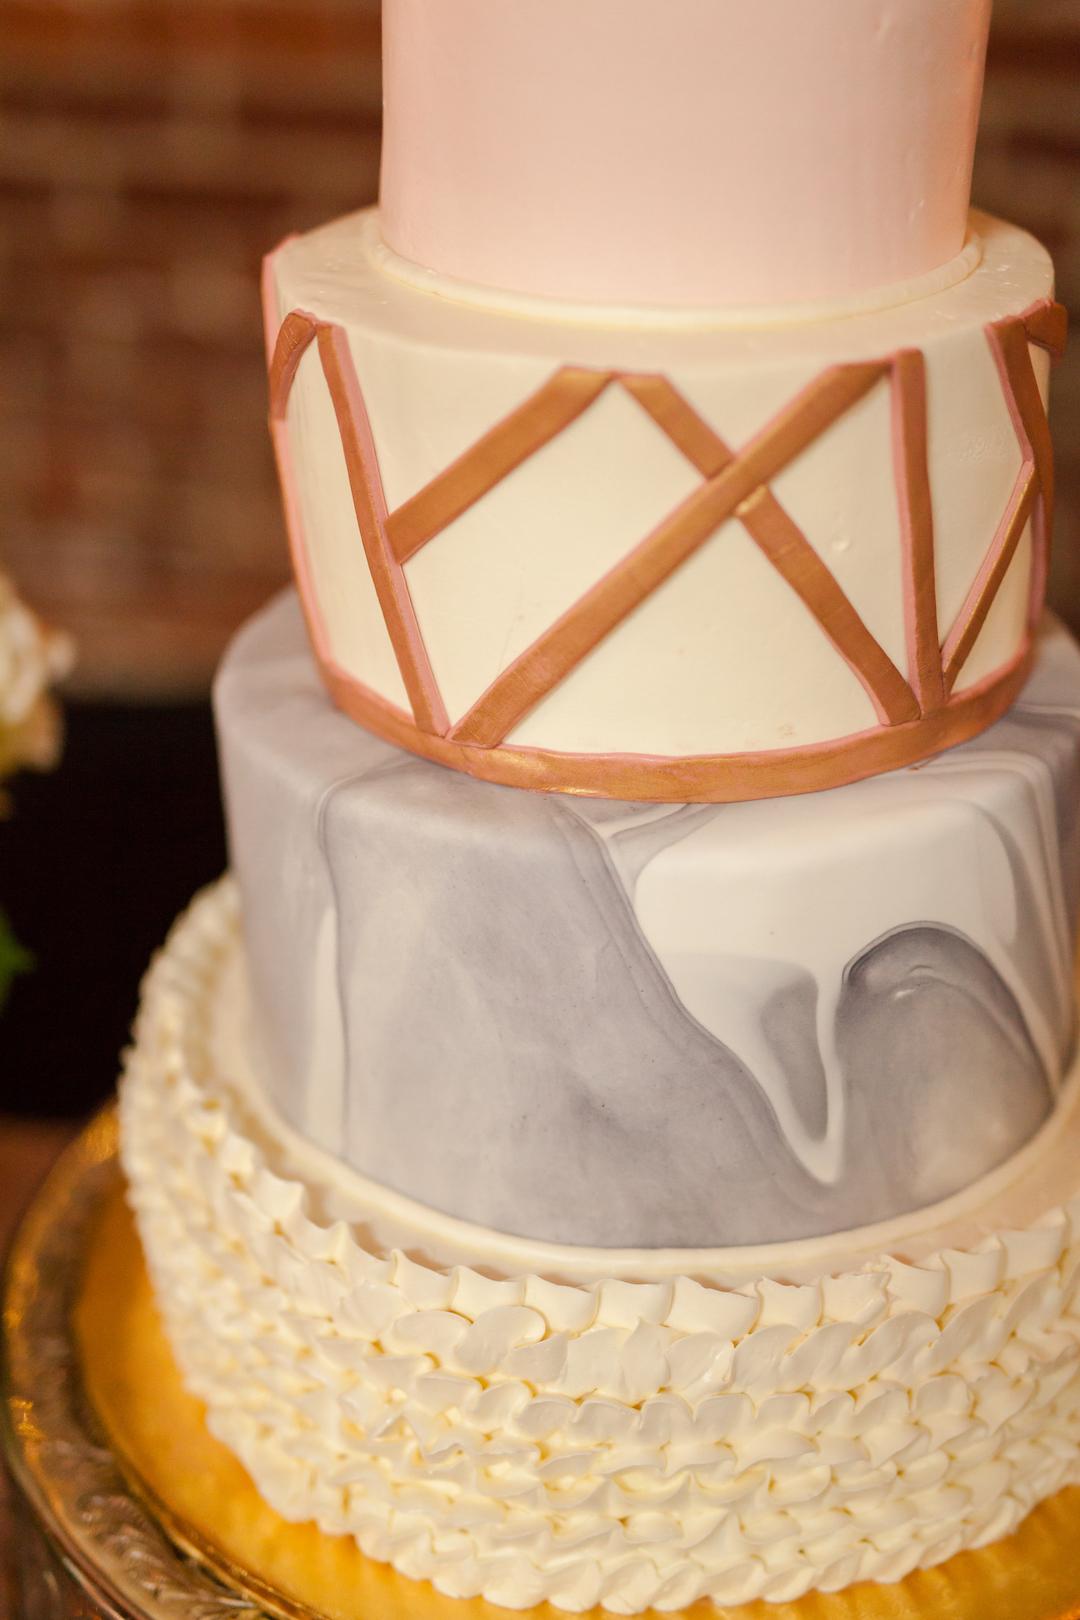 Wedding Cake Design: Romantic Blush & Metallic Inspired Wedding featured on Nashville Bride Guide